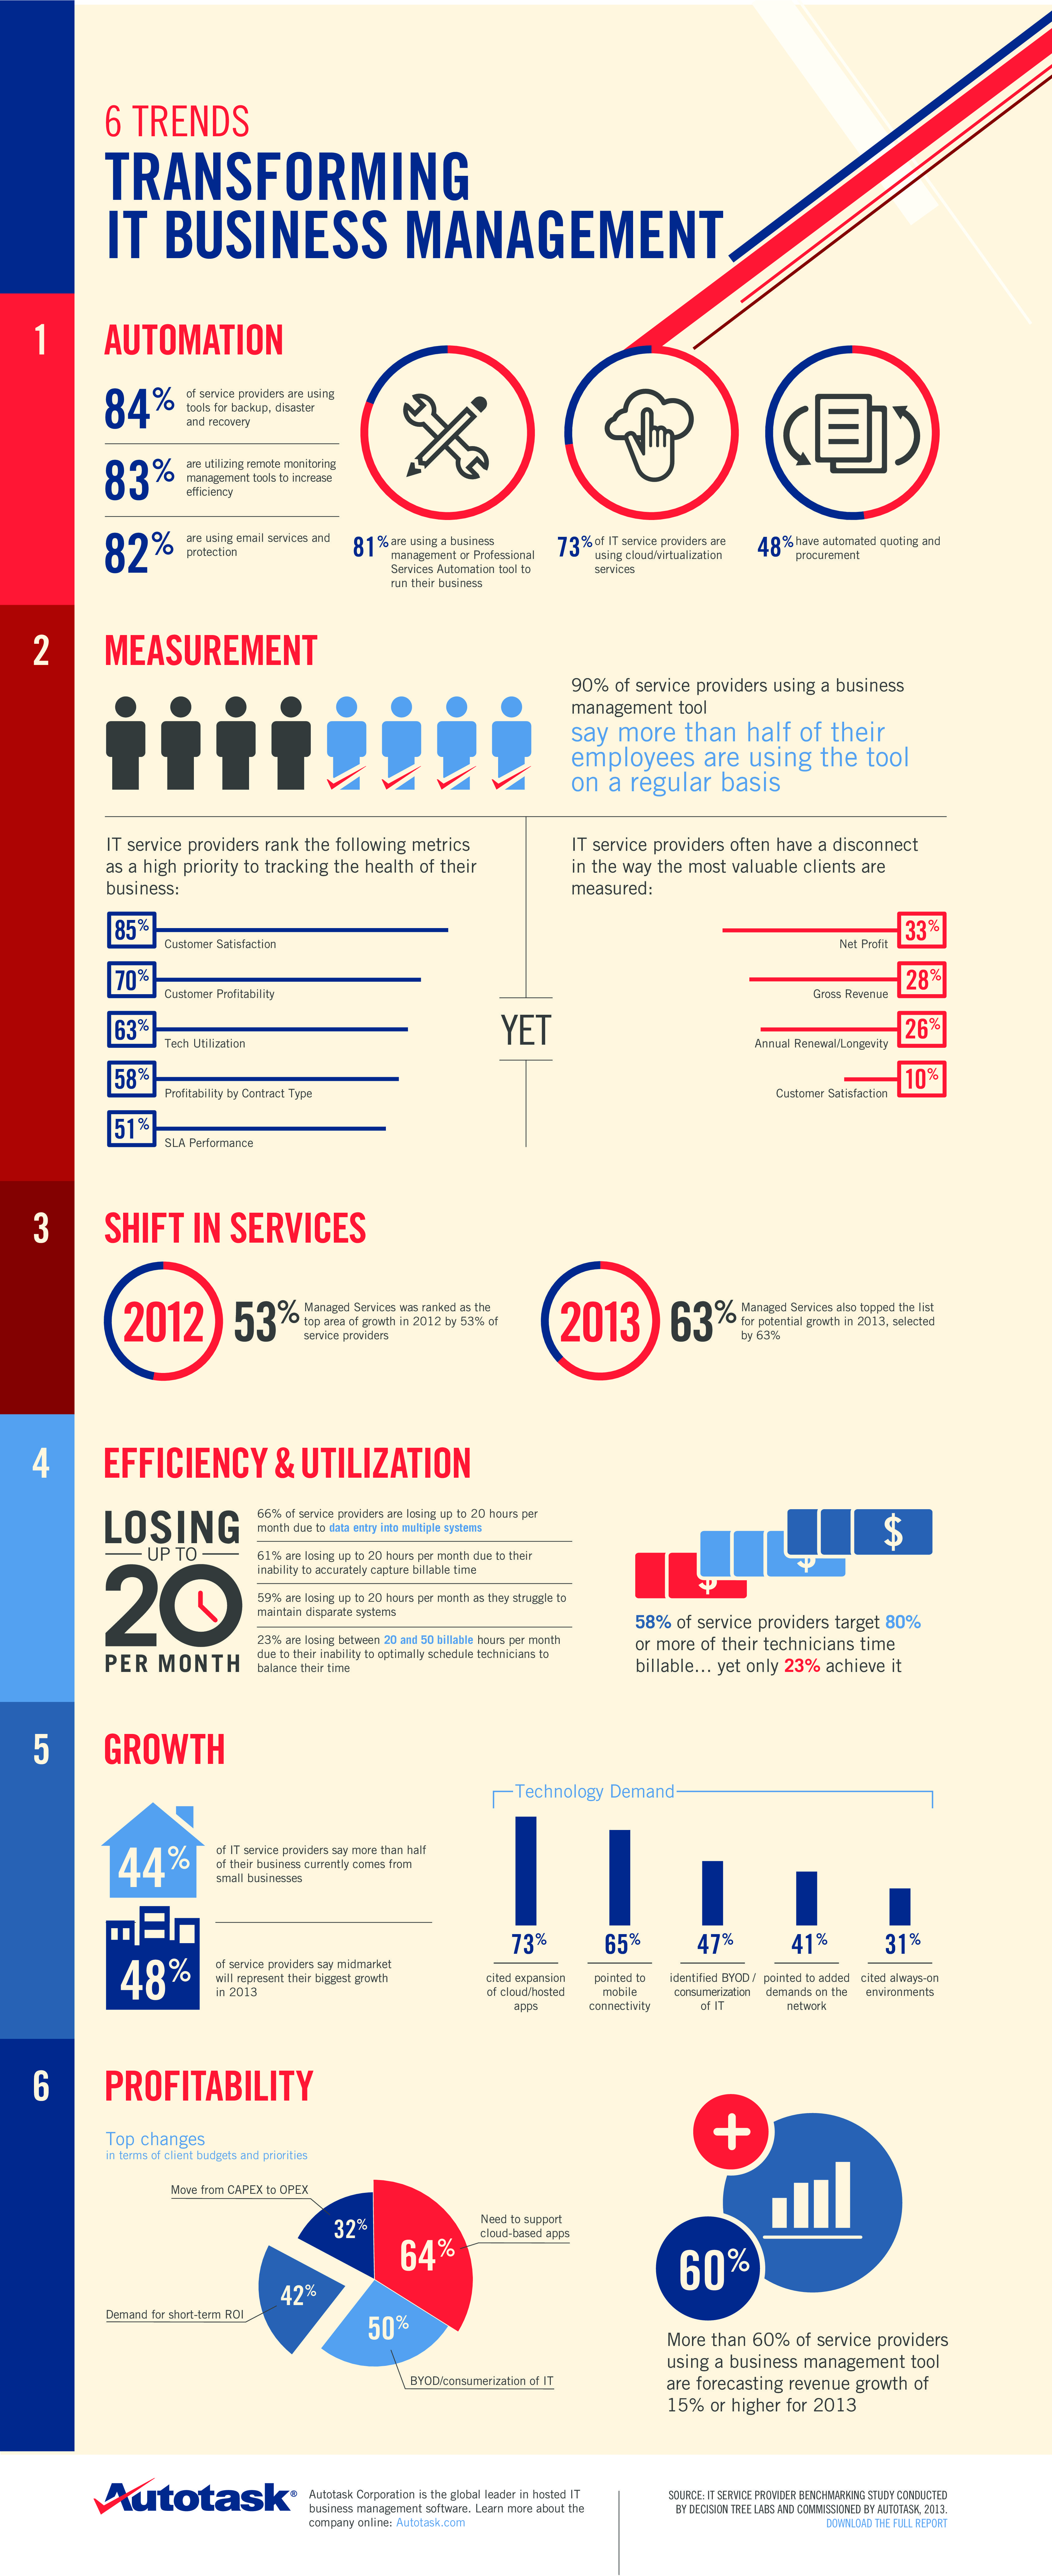 6 Trends Transforming It Business Management Infographic From Autotask Business Management Managed It Services Management